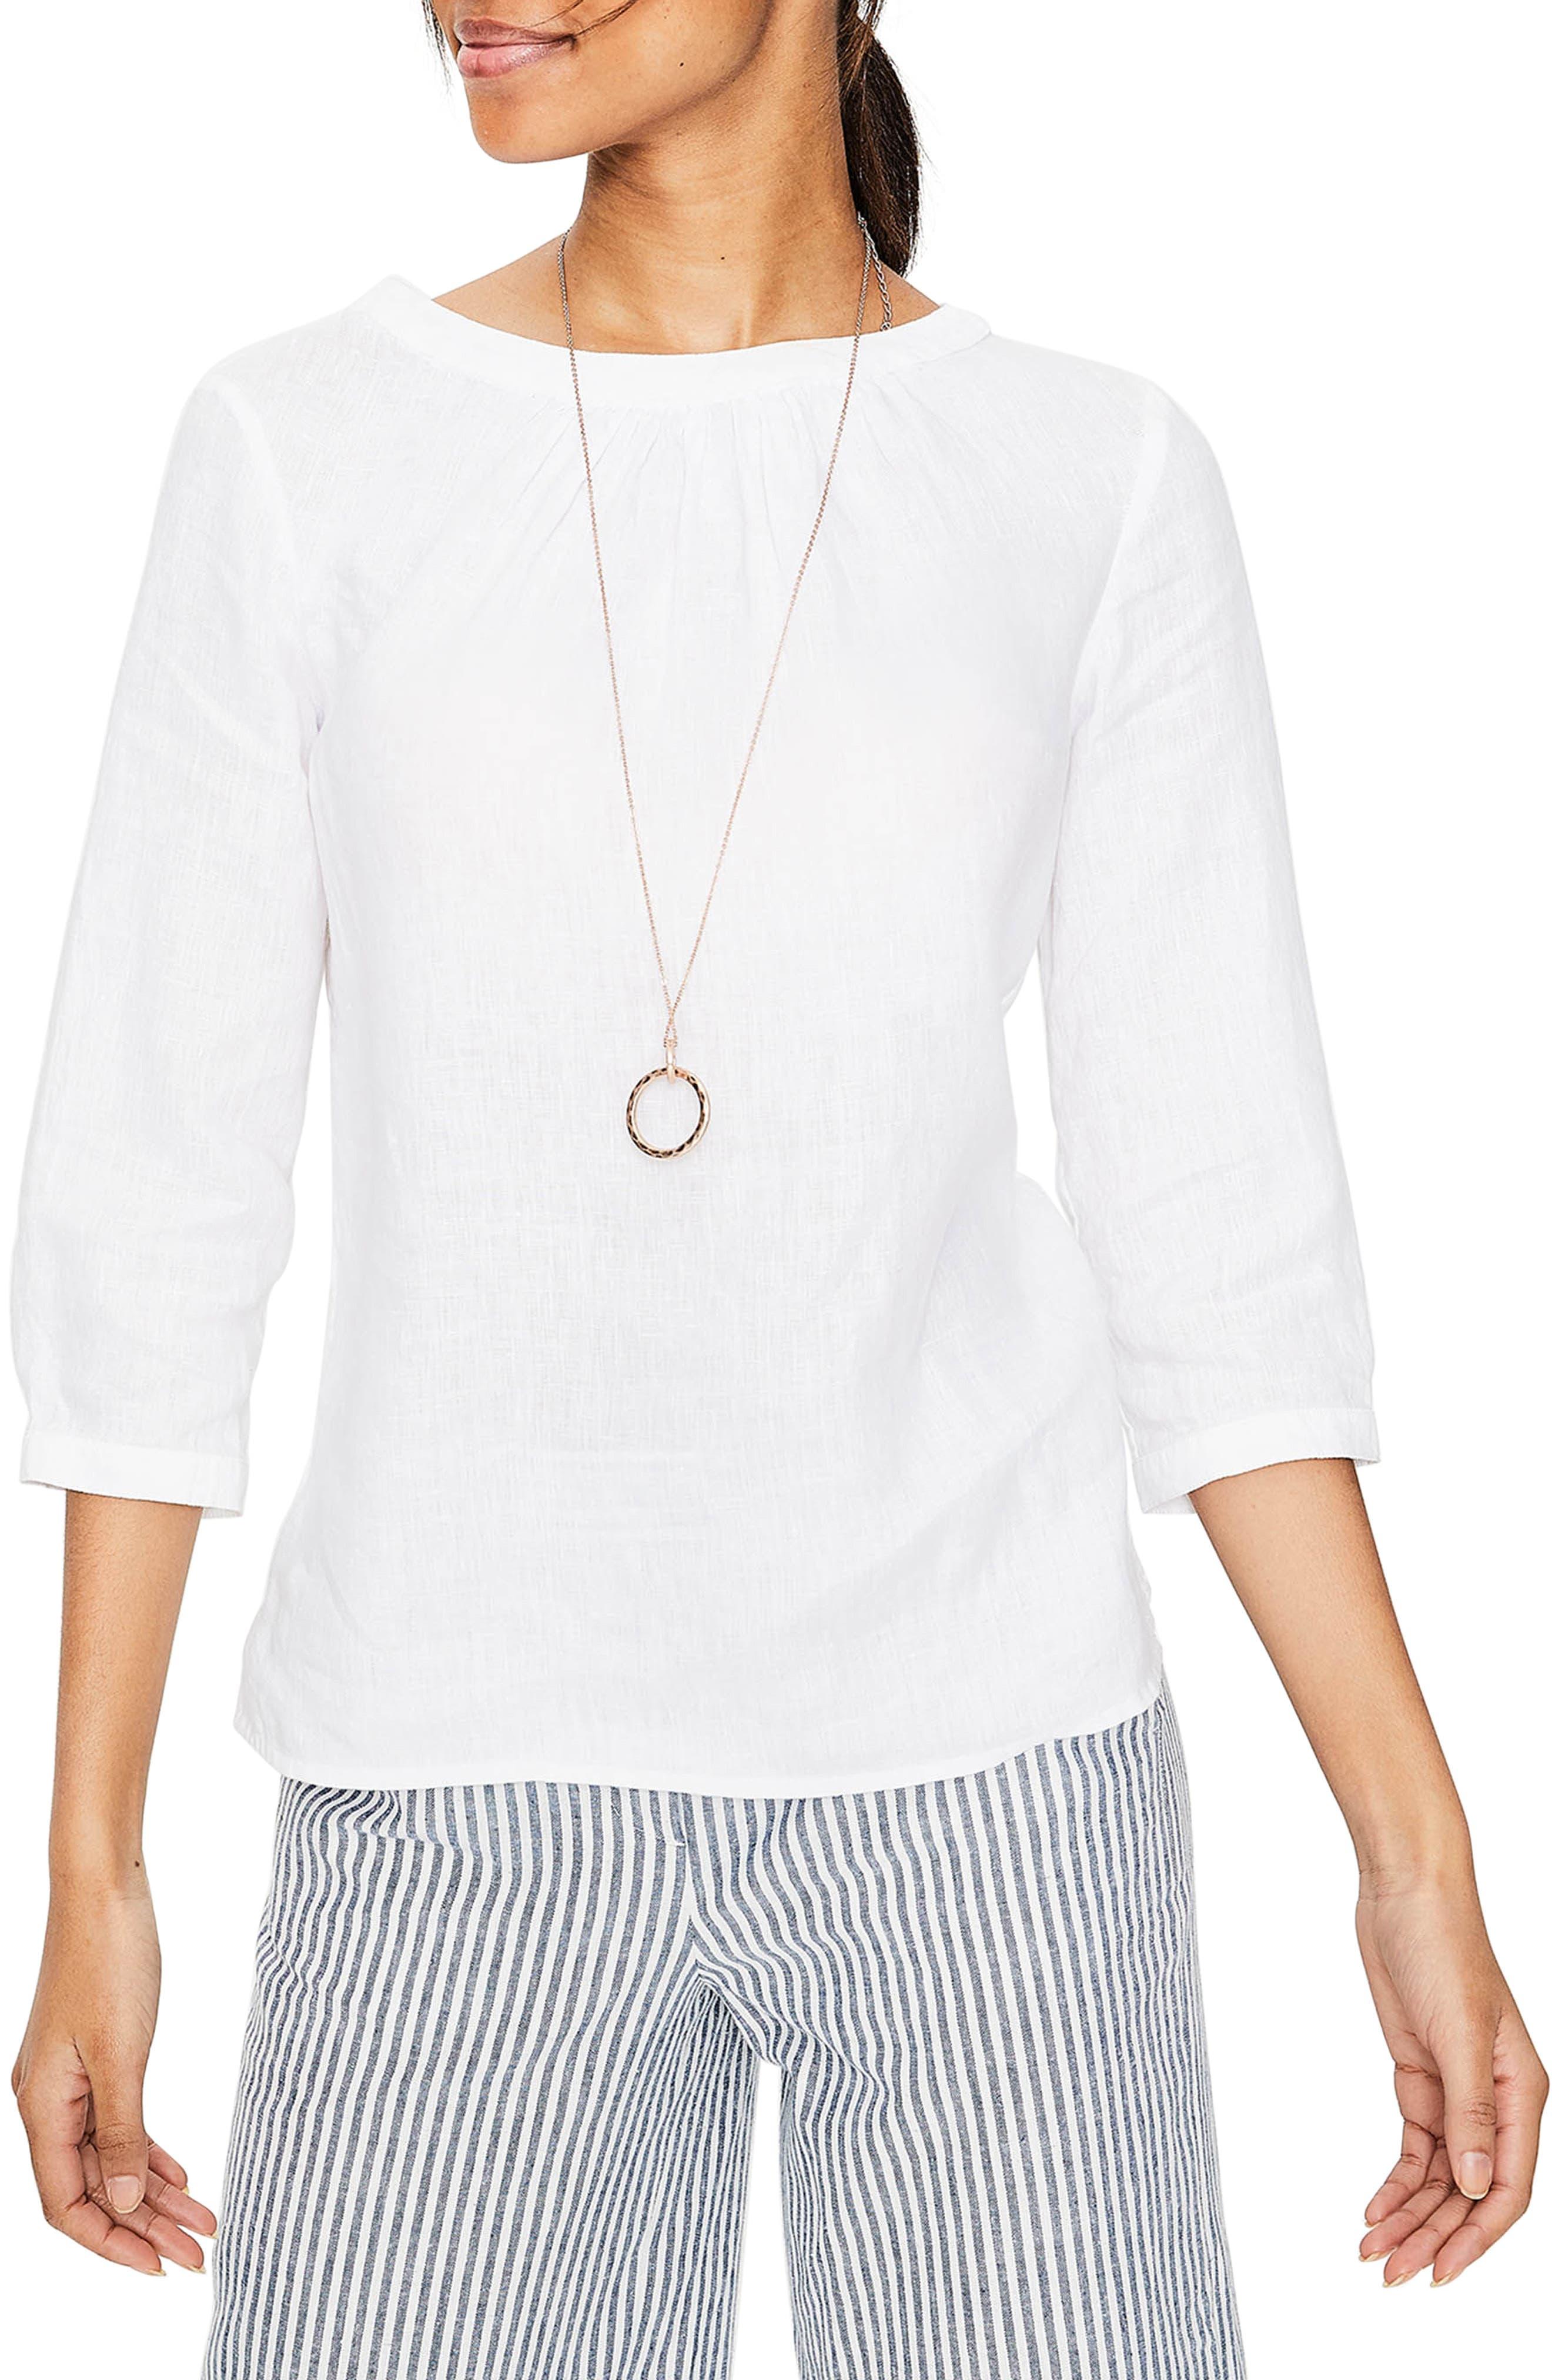 Katie Striped Linen Peasant Top,                         Main,                         color, White